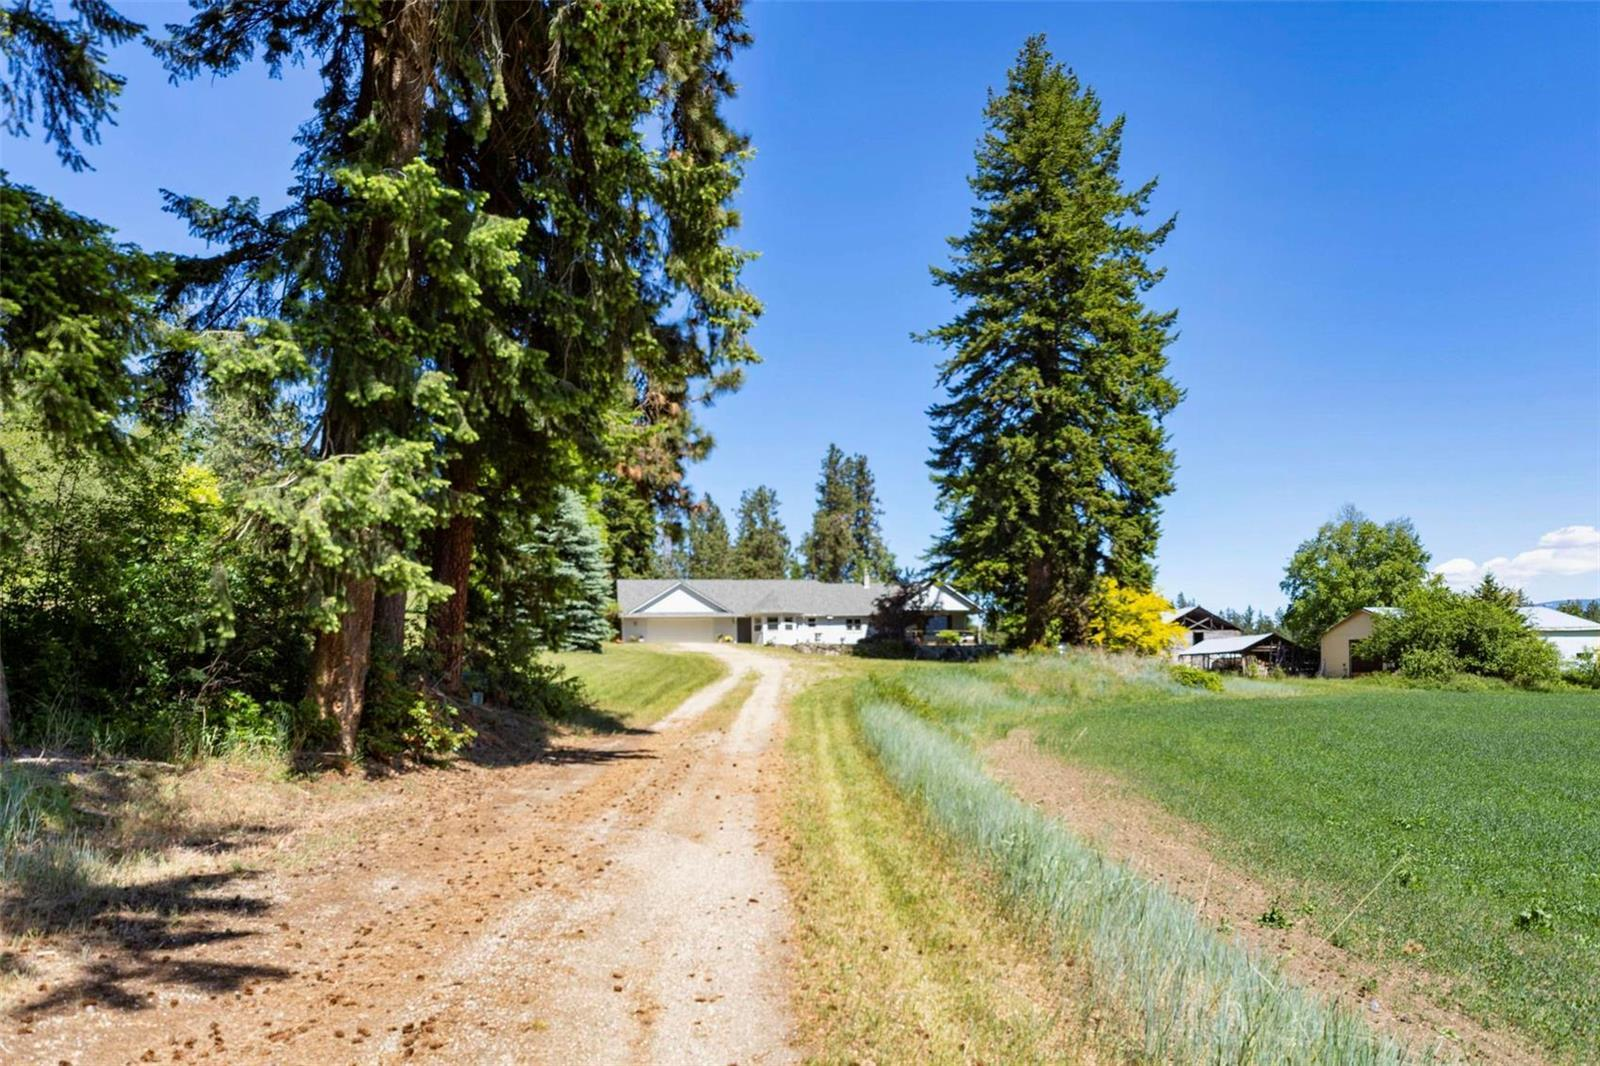 4602 Schubert Road,, Armstrong, British Columbia  V0E 1B4 - Photo 2 - 10232683